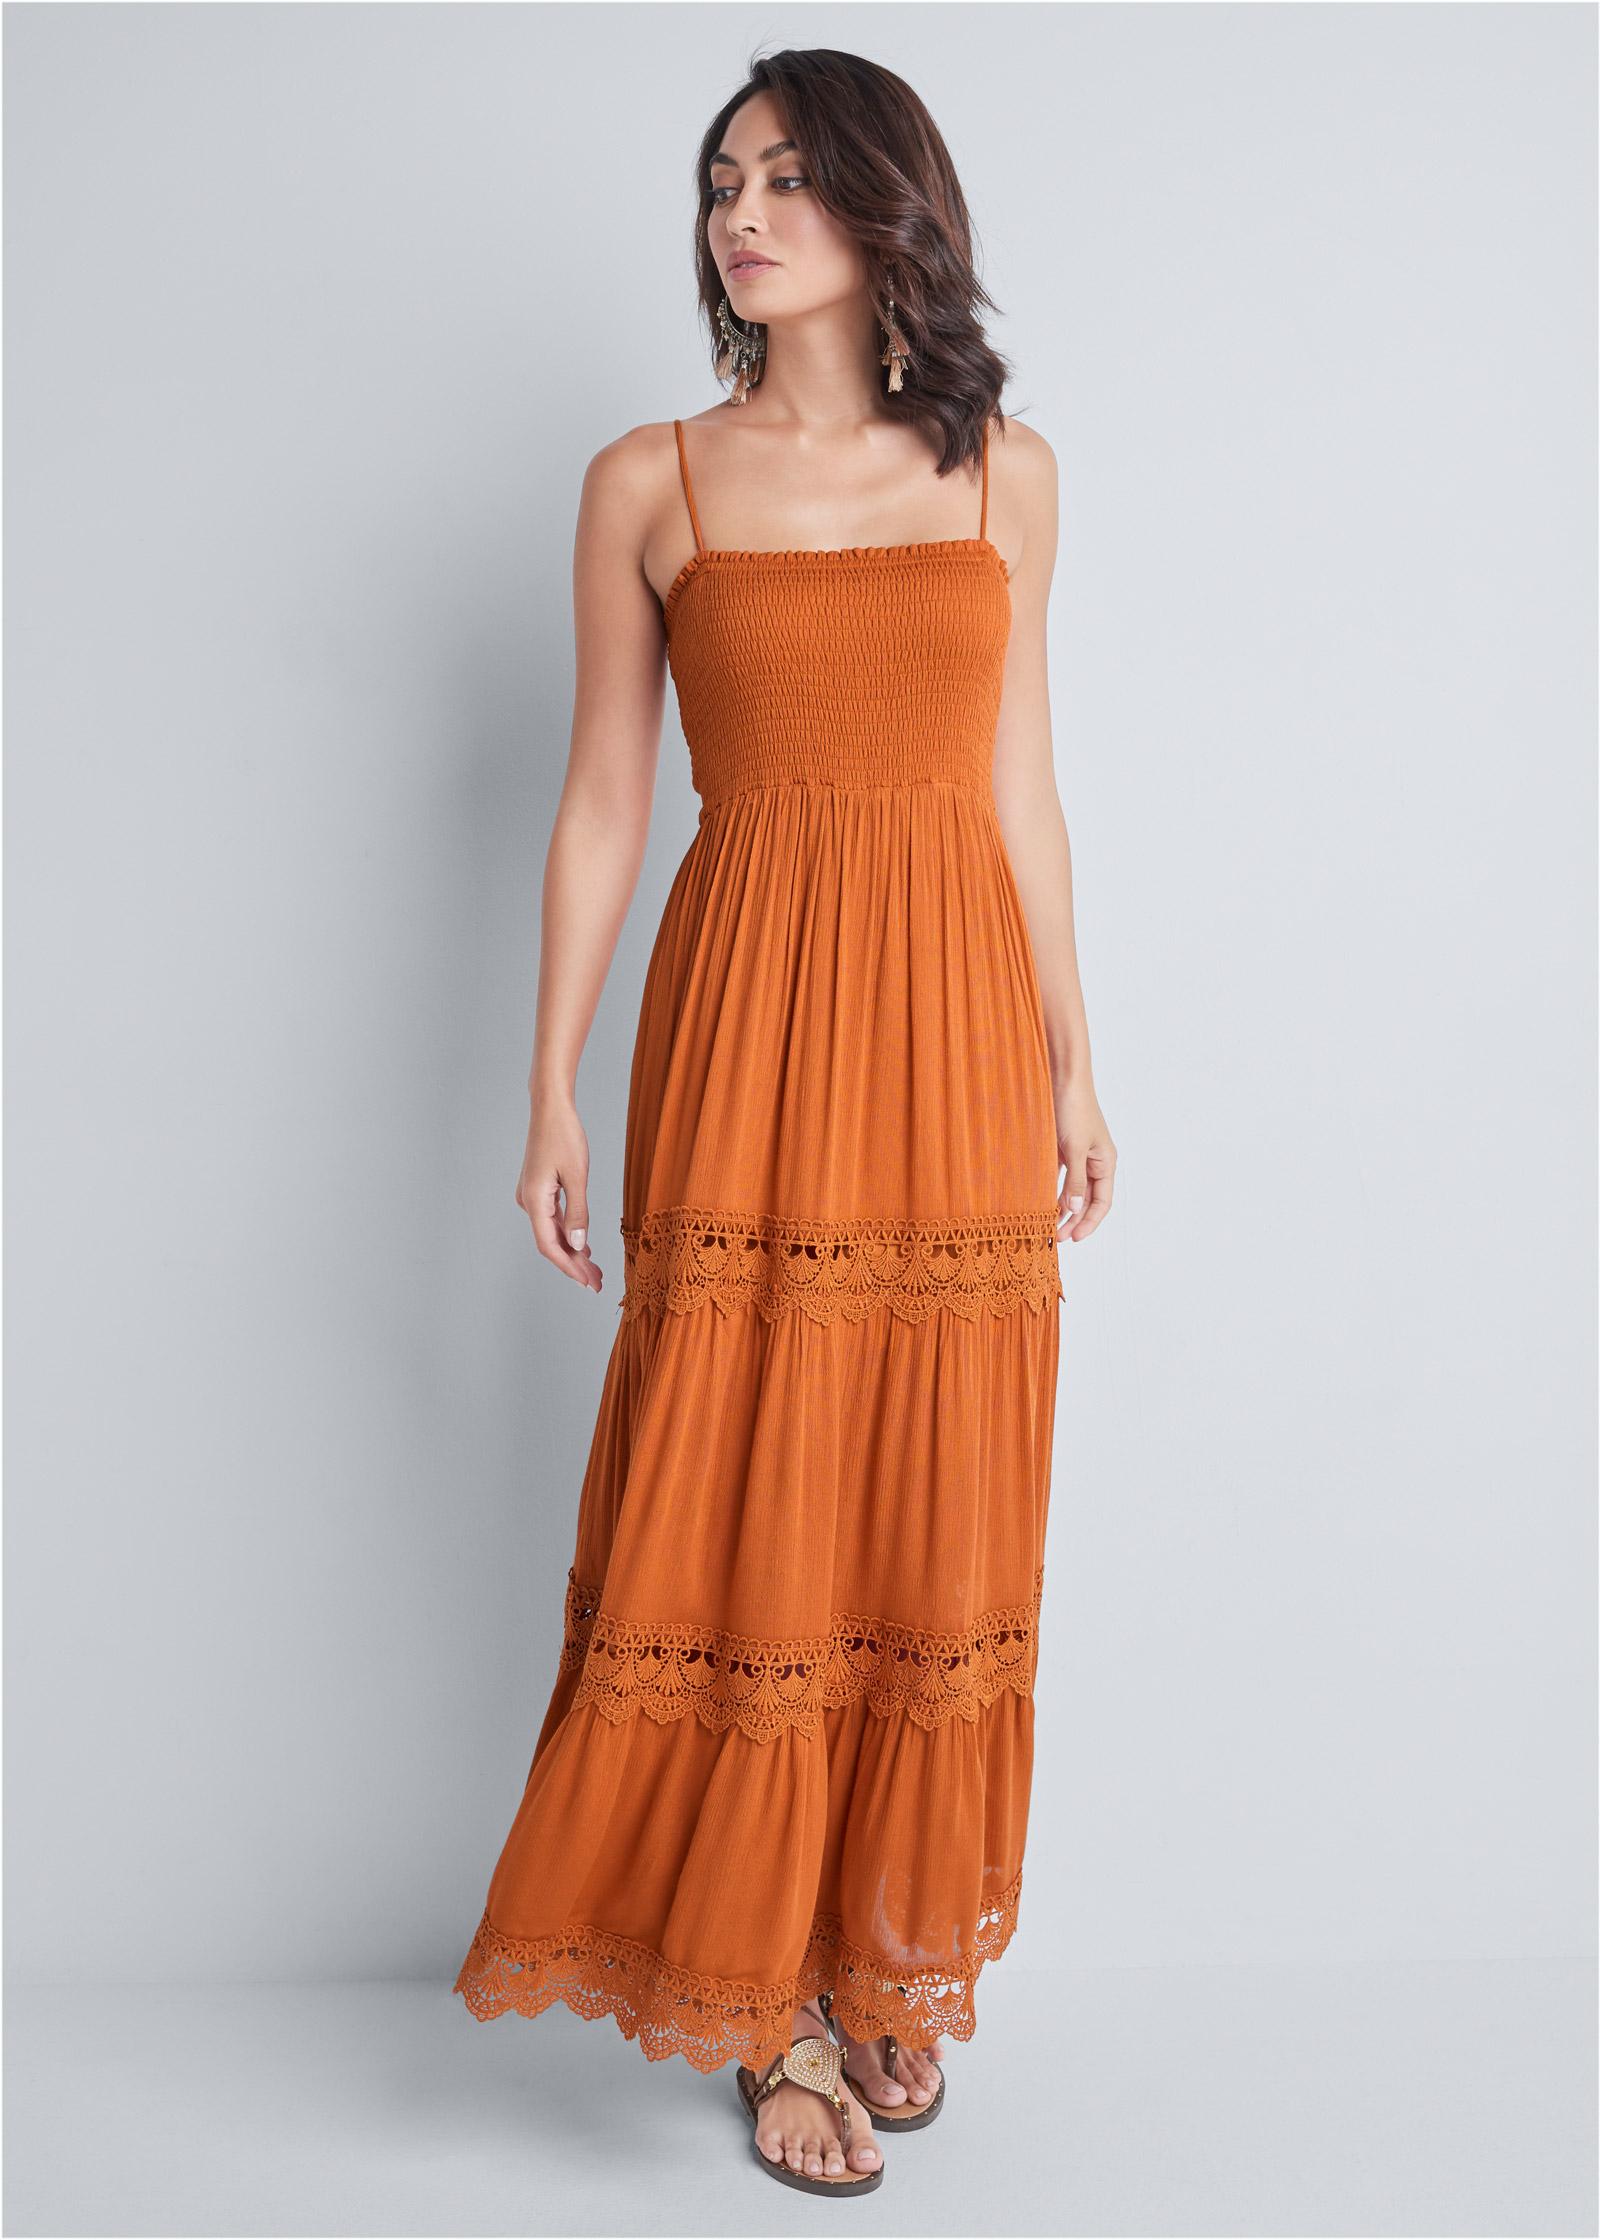 Orange Maxi Dresses,Orange Maxi Dress,Orange Maxi Dress,orange maxi dress,